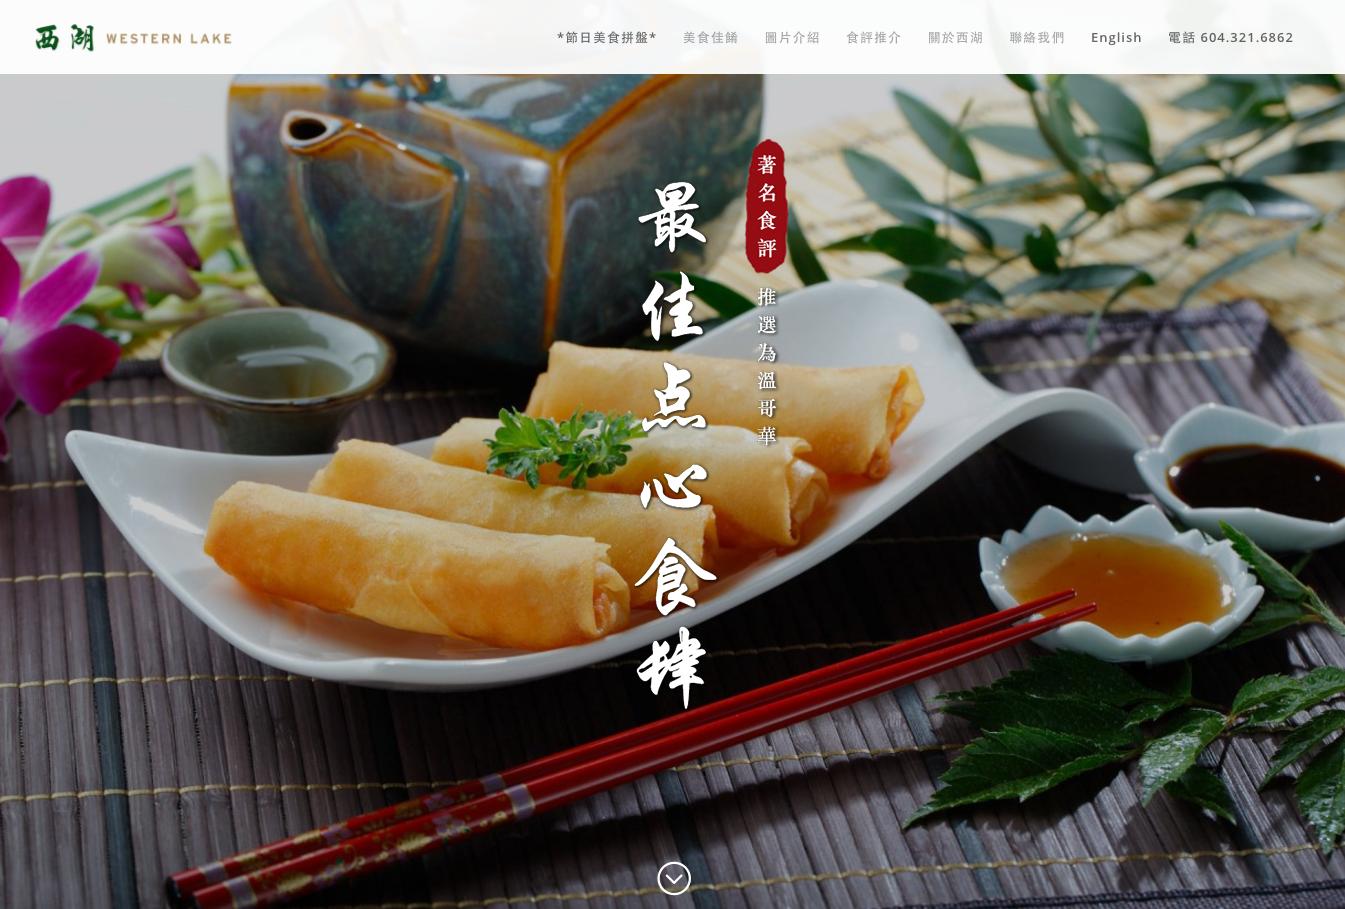 Western Lake Chinese Restaurant Website